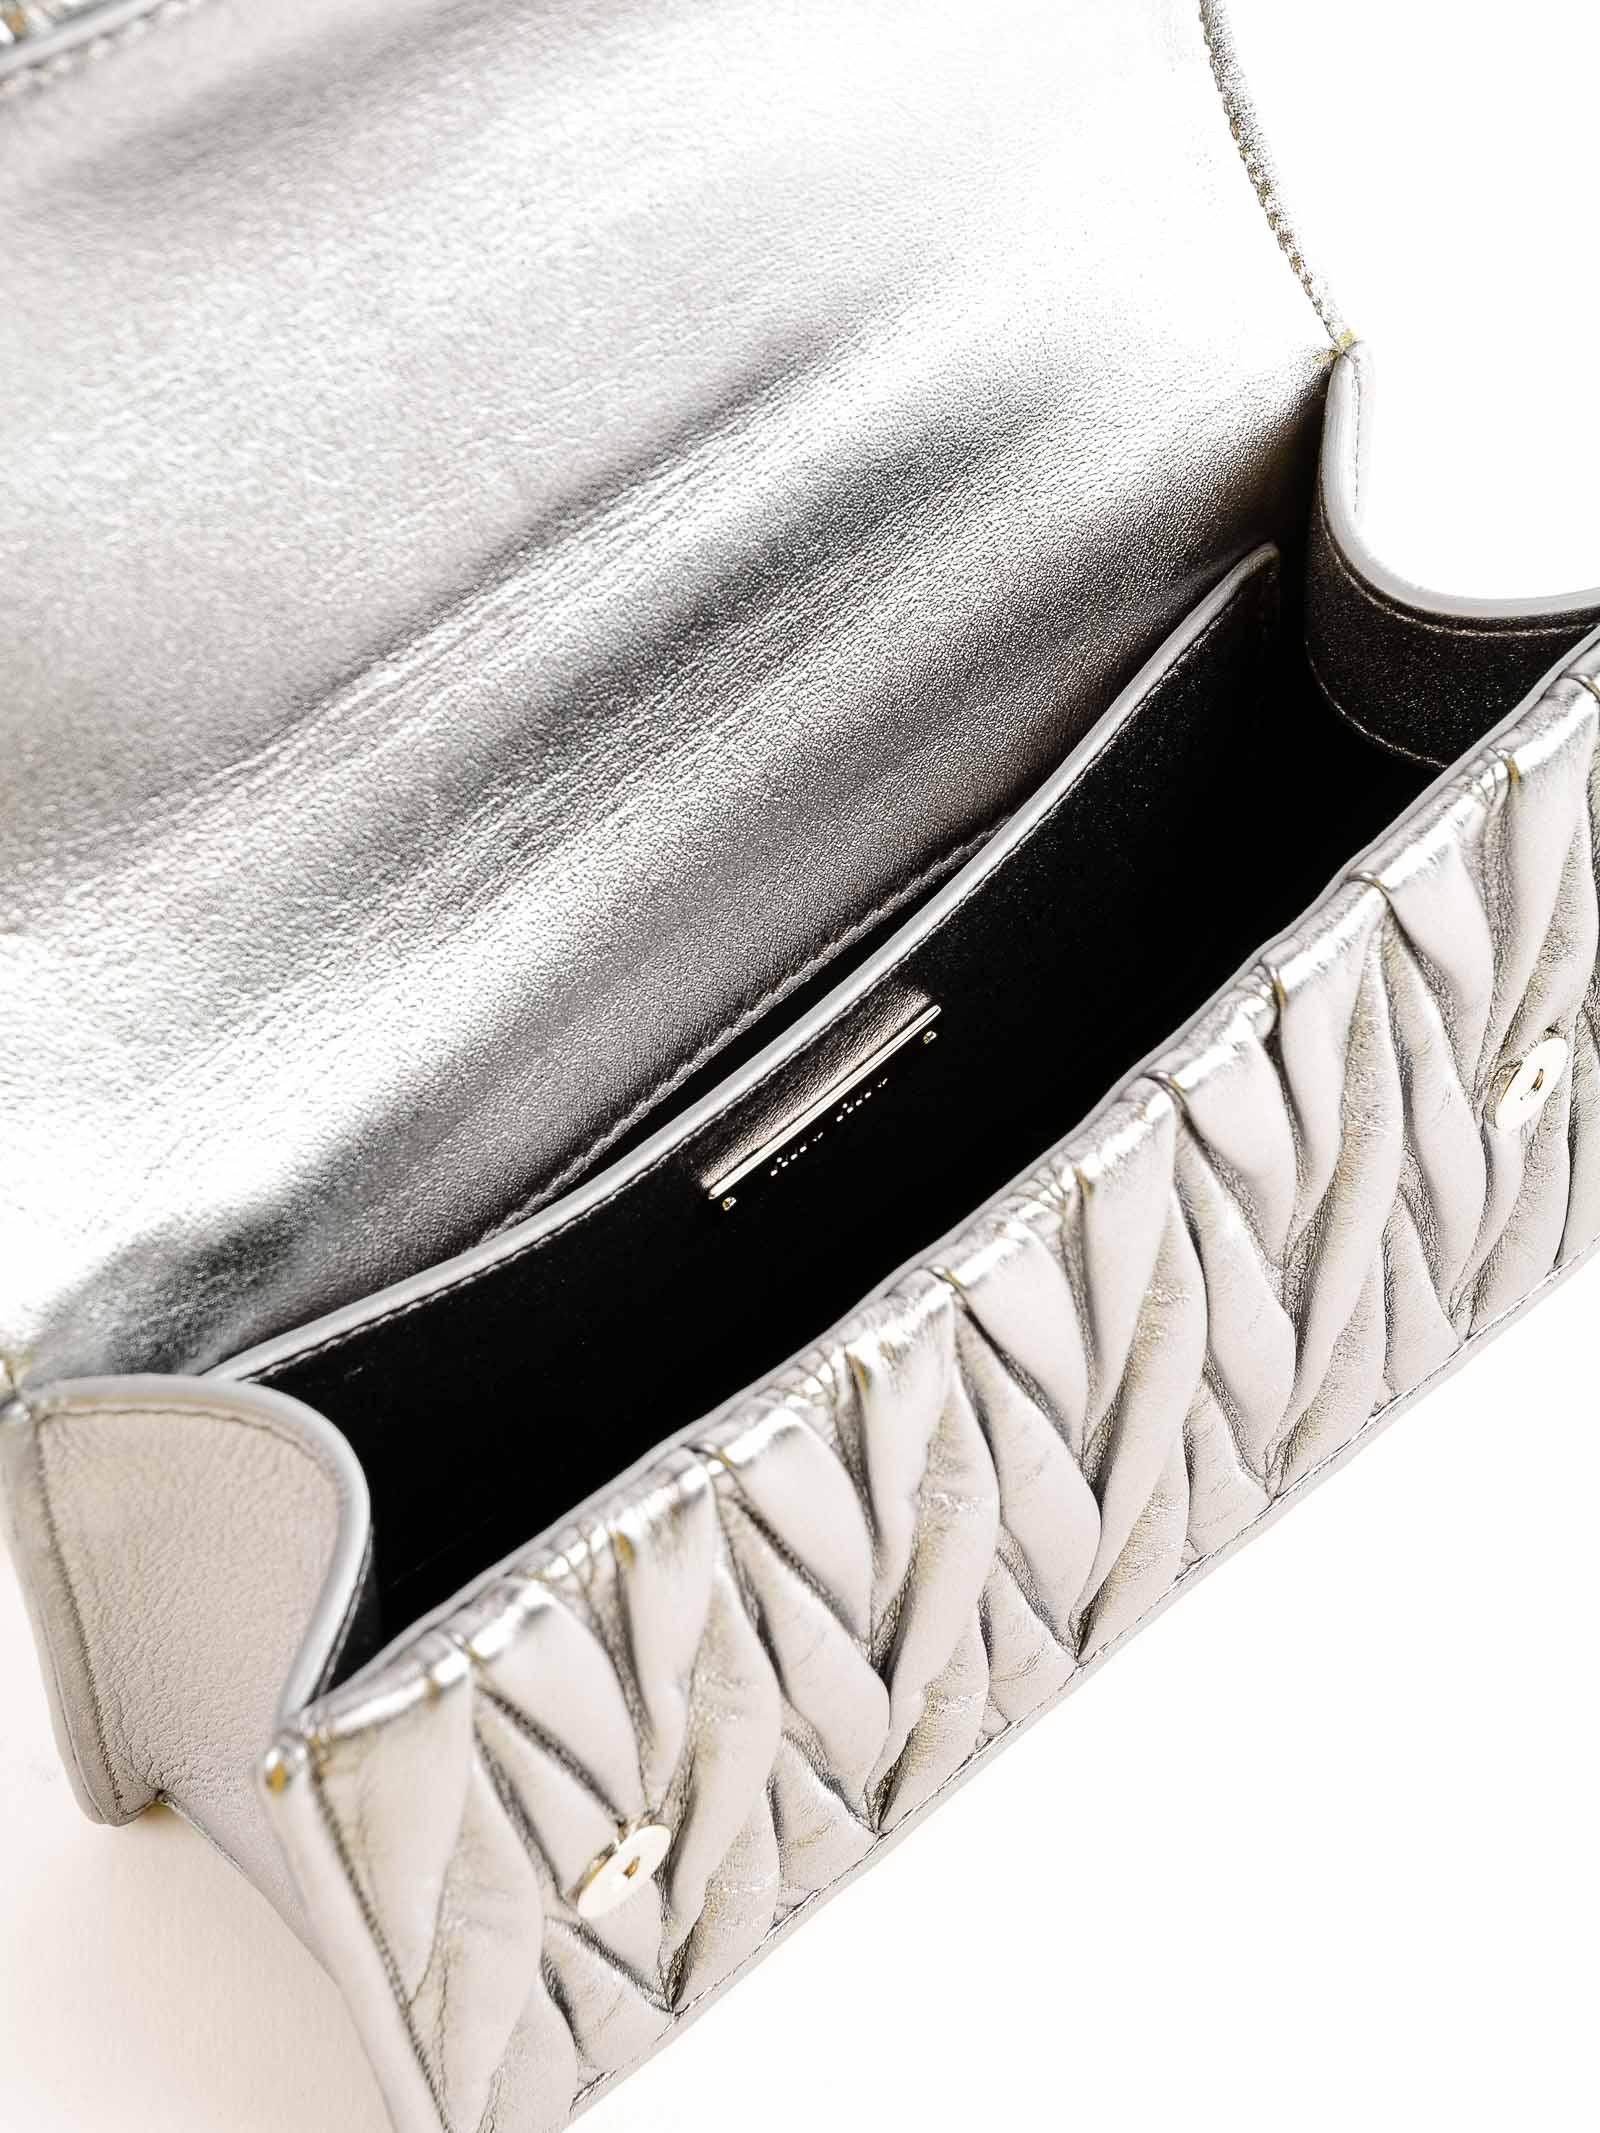 Miu Miu Leather Matelasse Crossbody Bag